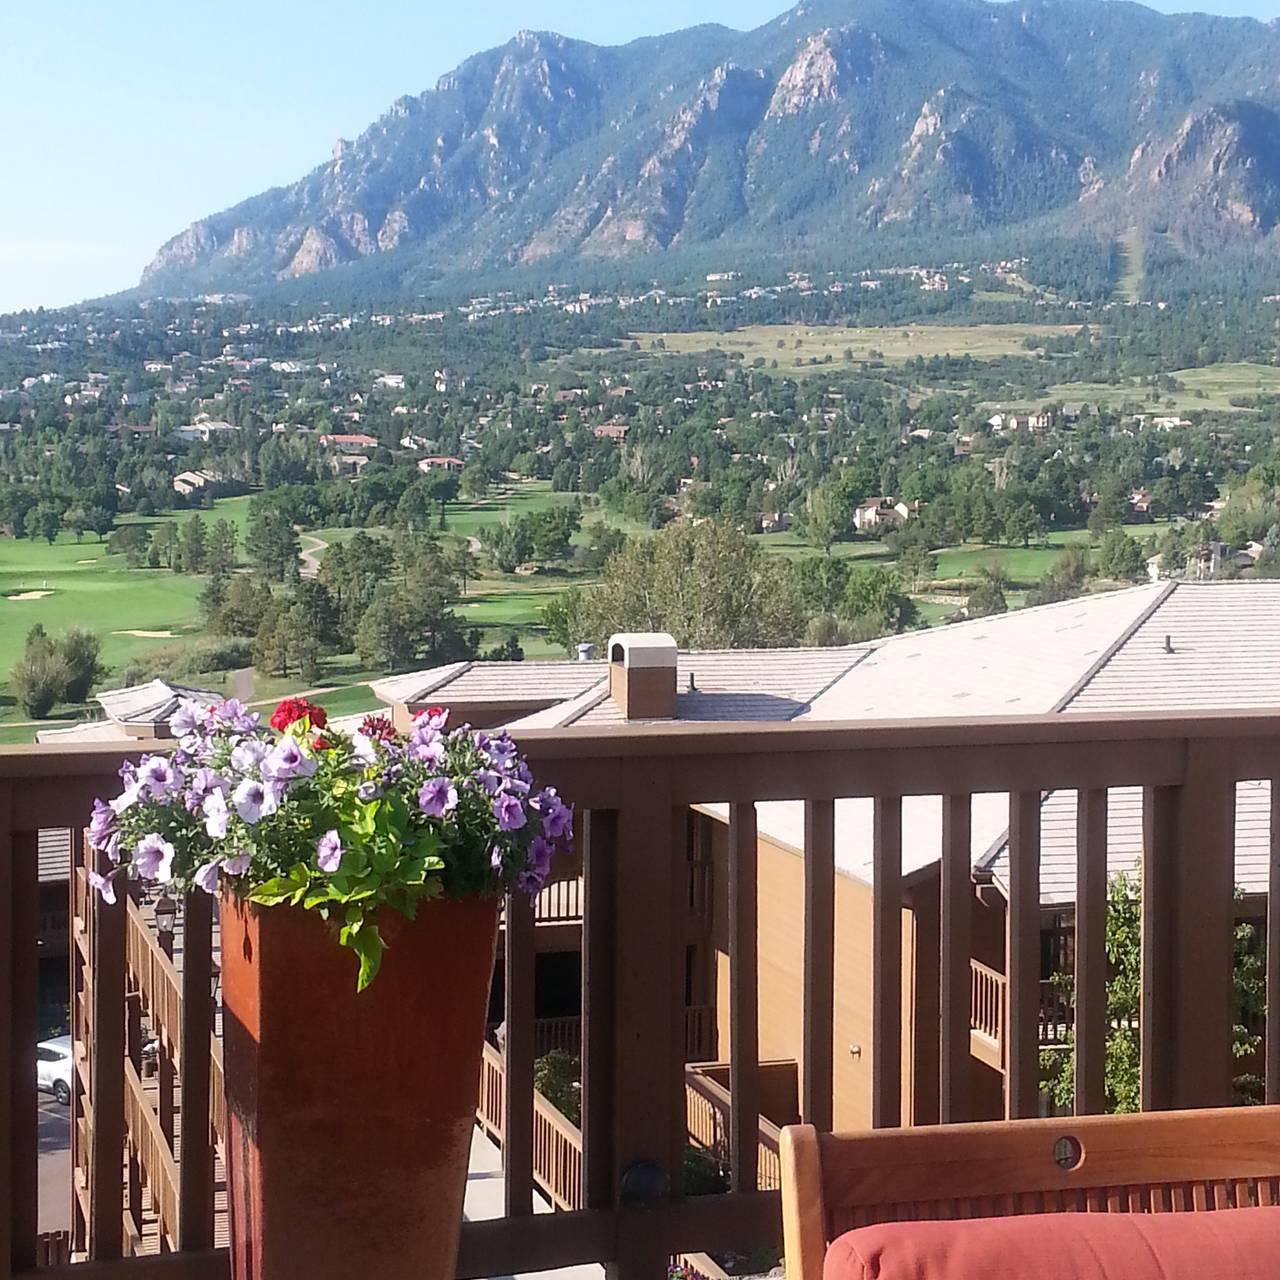 mountain view restaurant at cheyenne mountain colorado springs, a